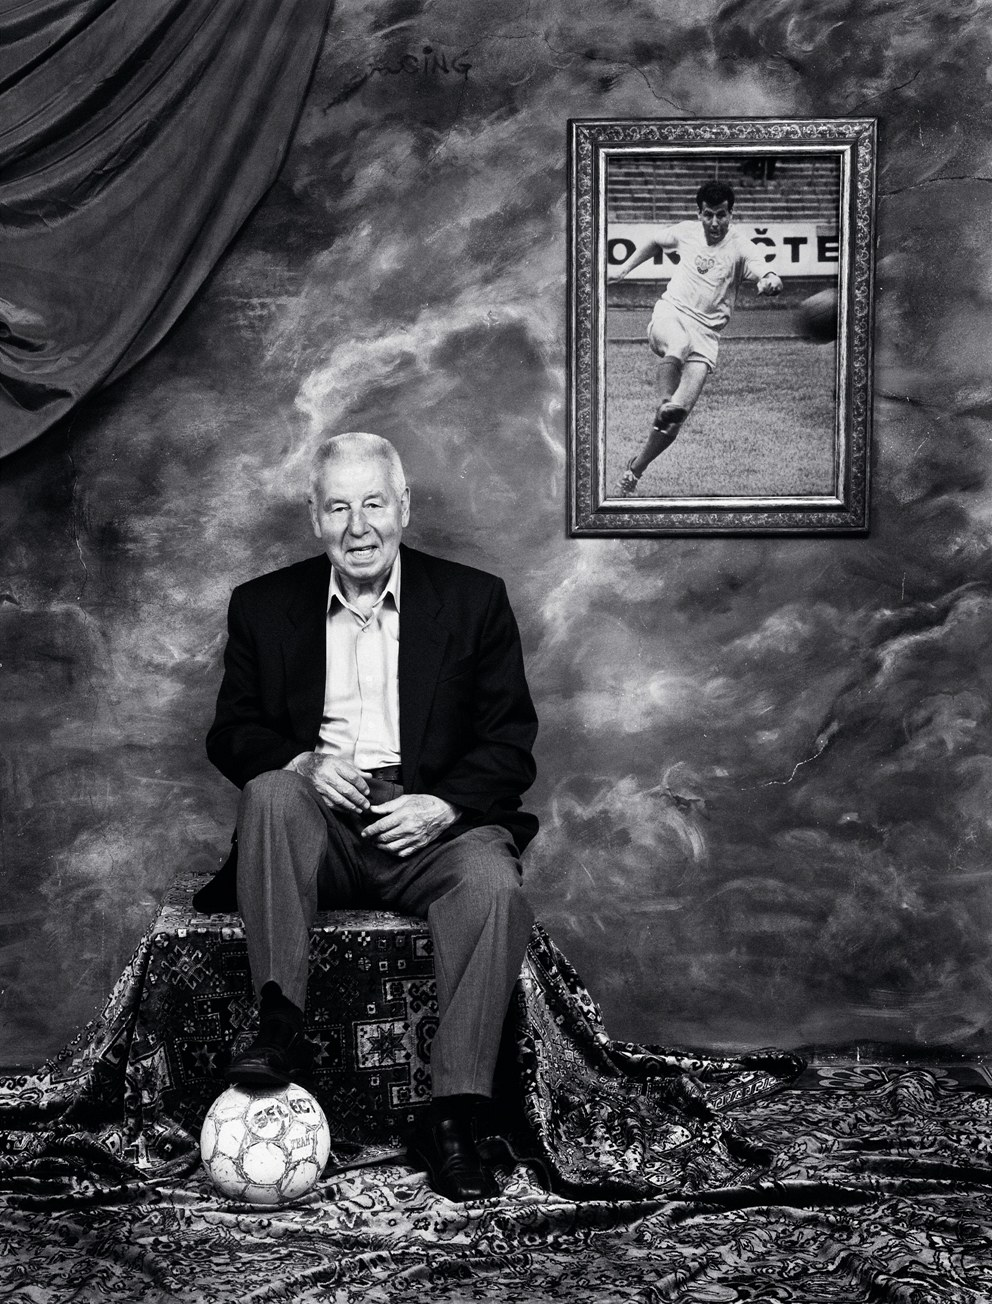 Fotogalerie B½val½ fotbalista Josef Masopust v kalendáři Dukly 2013